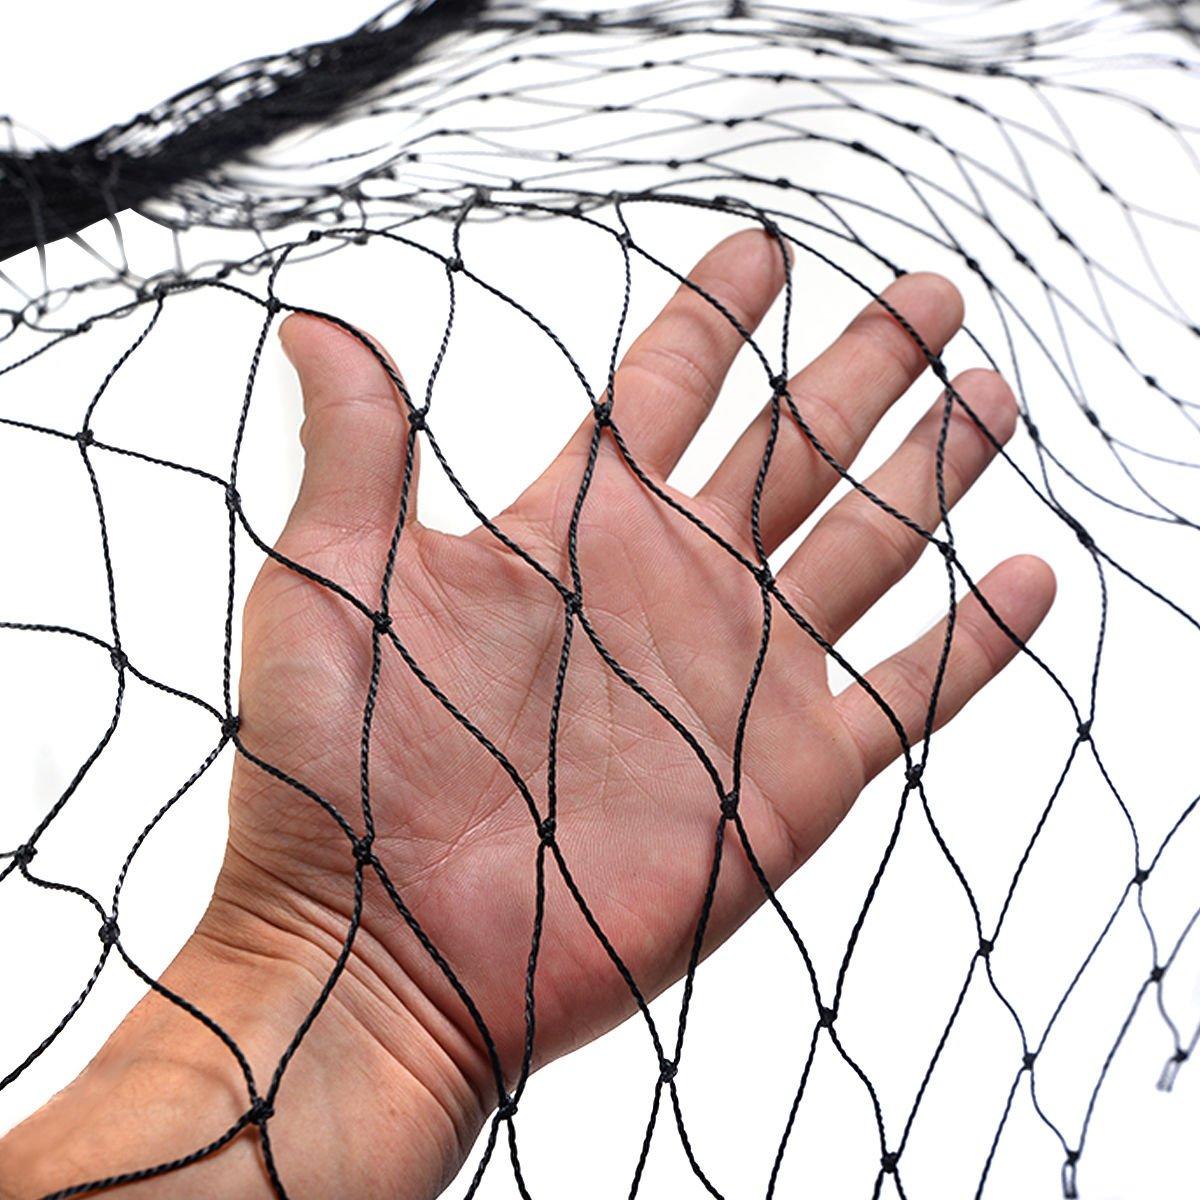 Anti Bird Netting 25'X50' Soccer Baseball Game Poultry Fish Net 2''x2'' Mesh